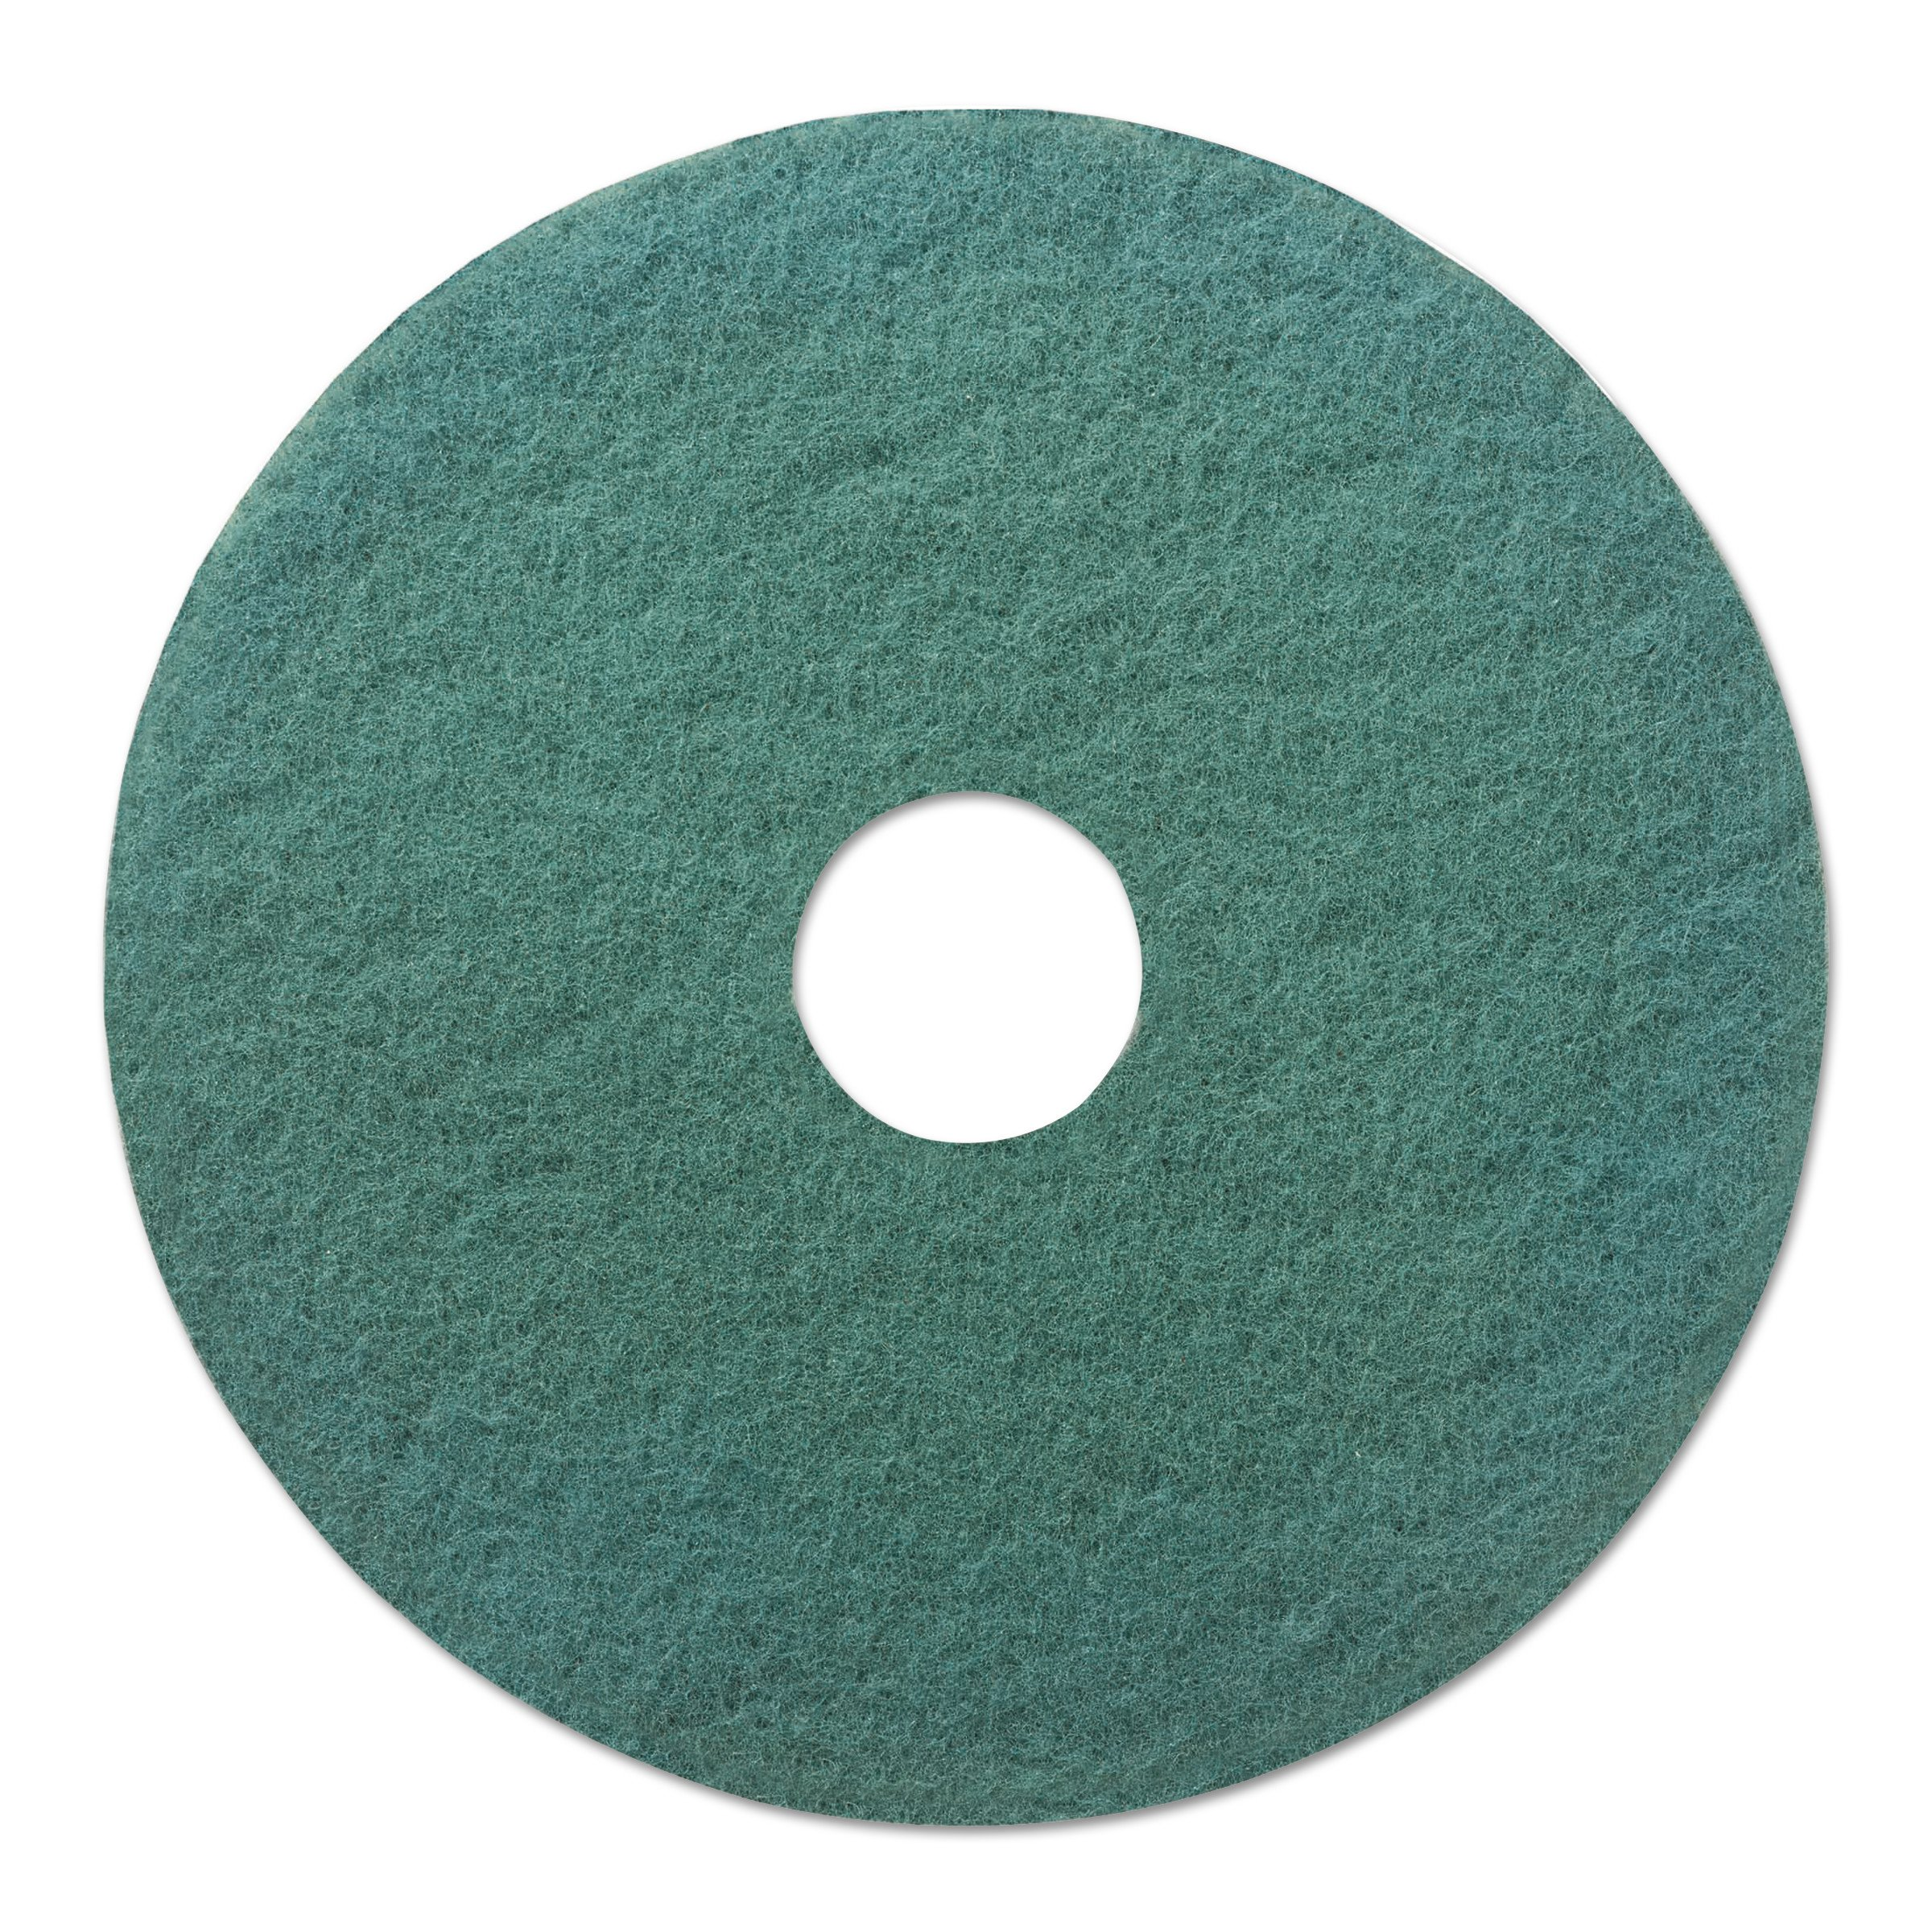 Boardwalk 4020GRE Standard Floor Pads, 20'' Diameter, Green (Case of 5) by Premiere Pads